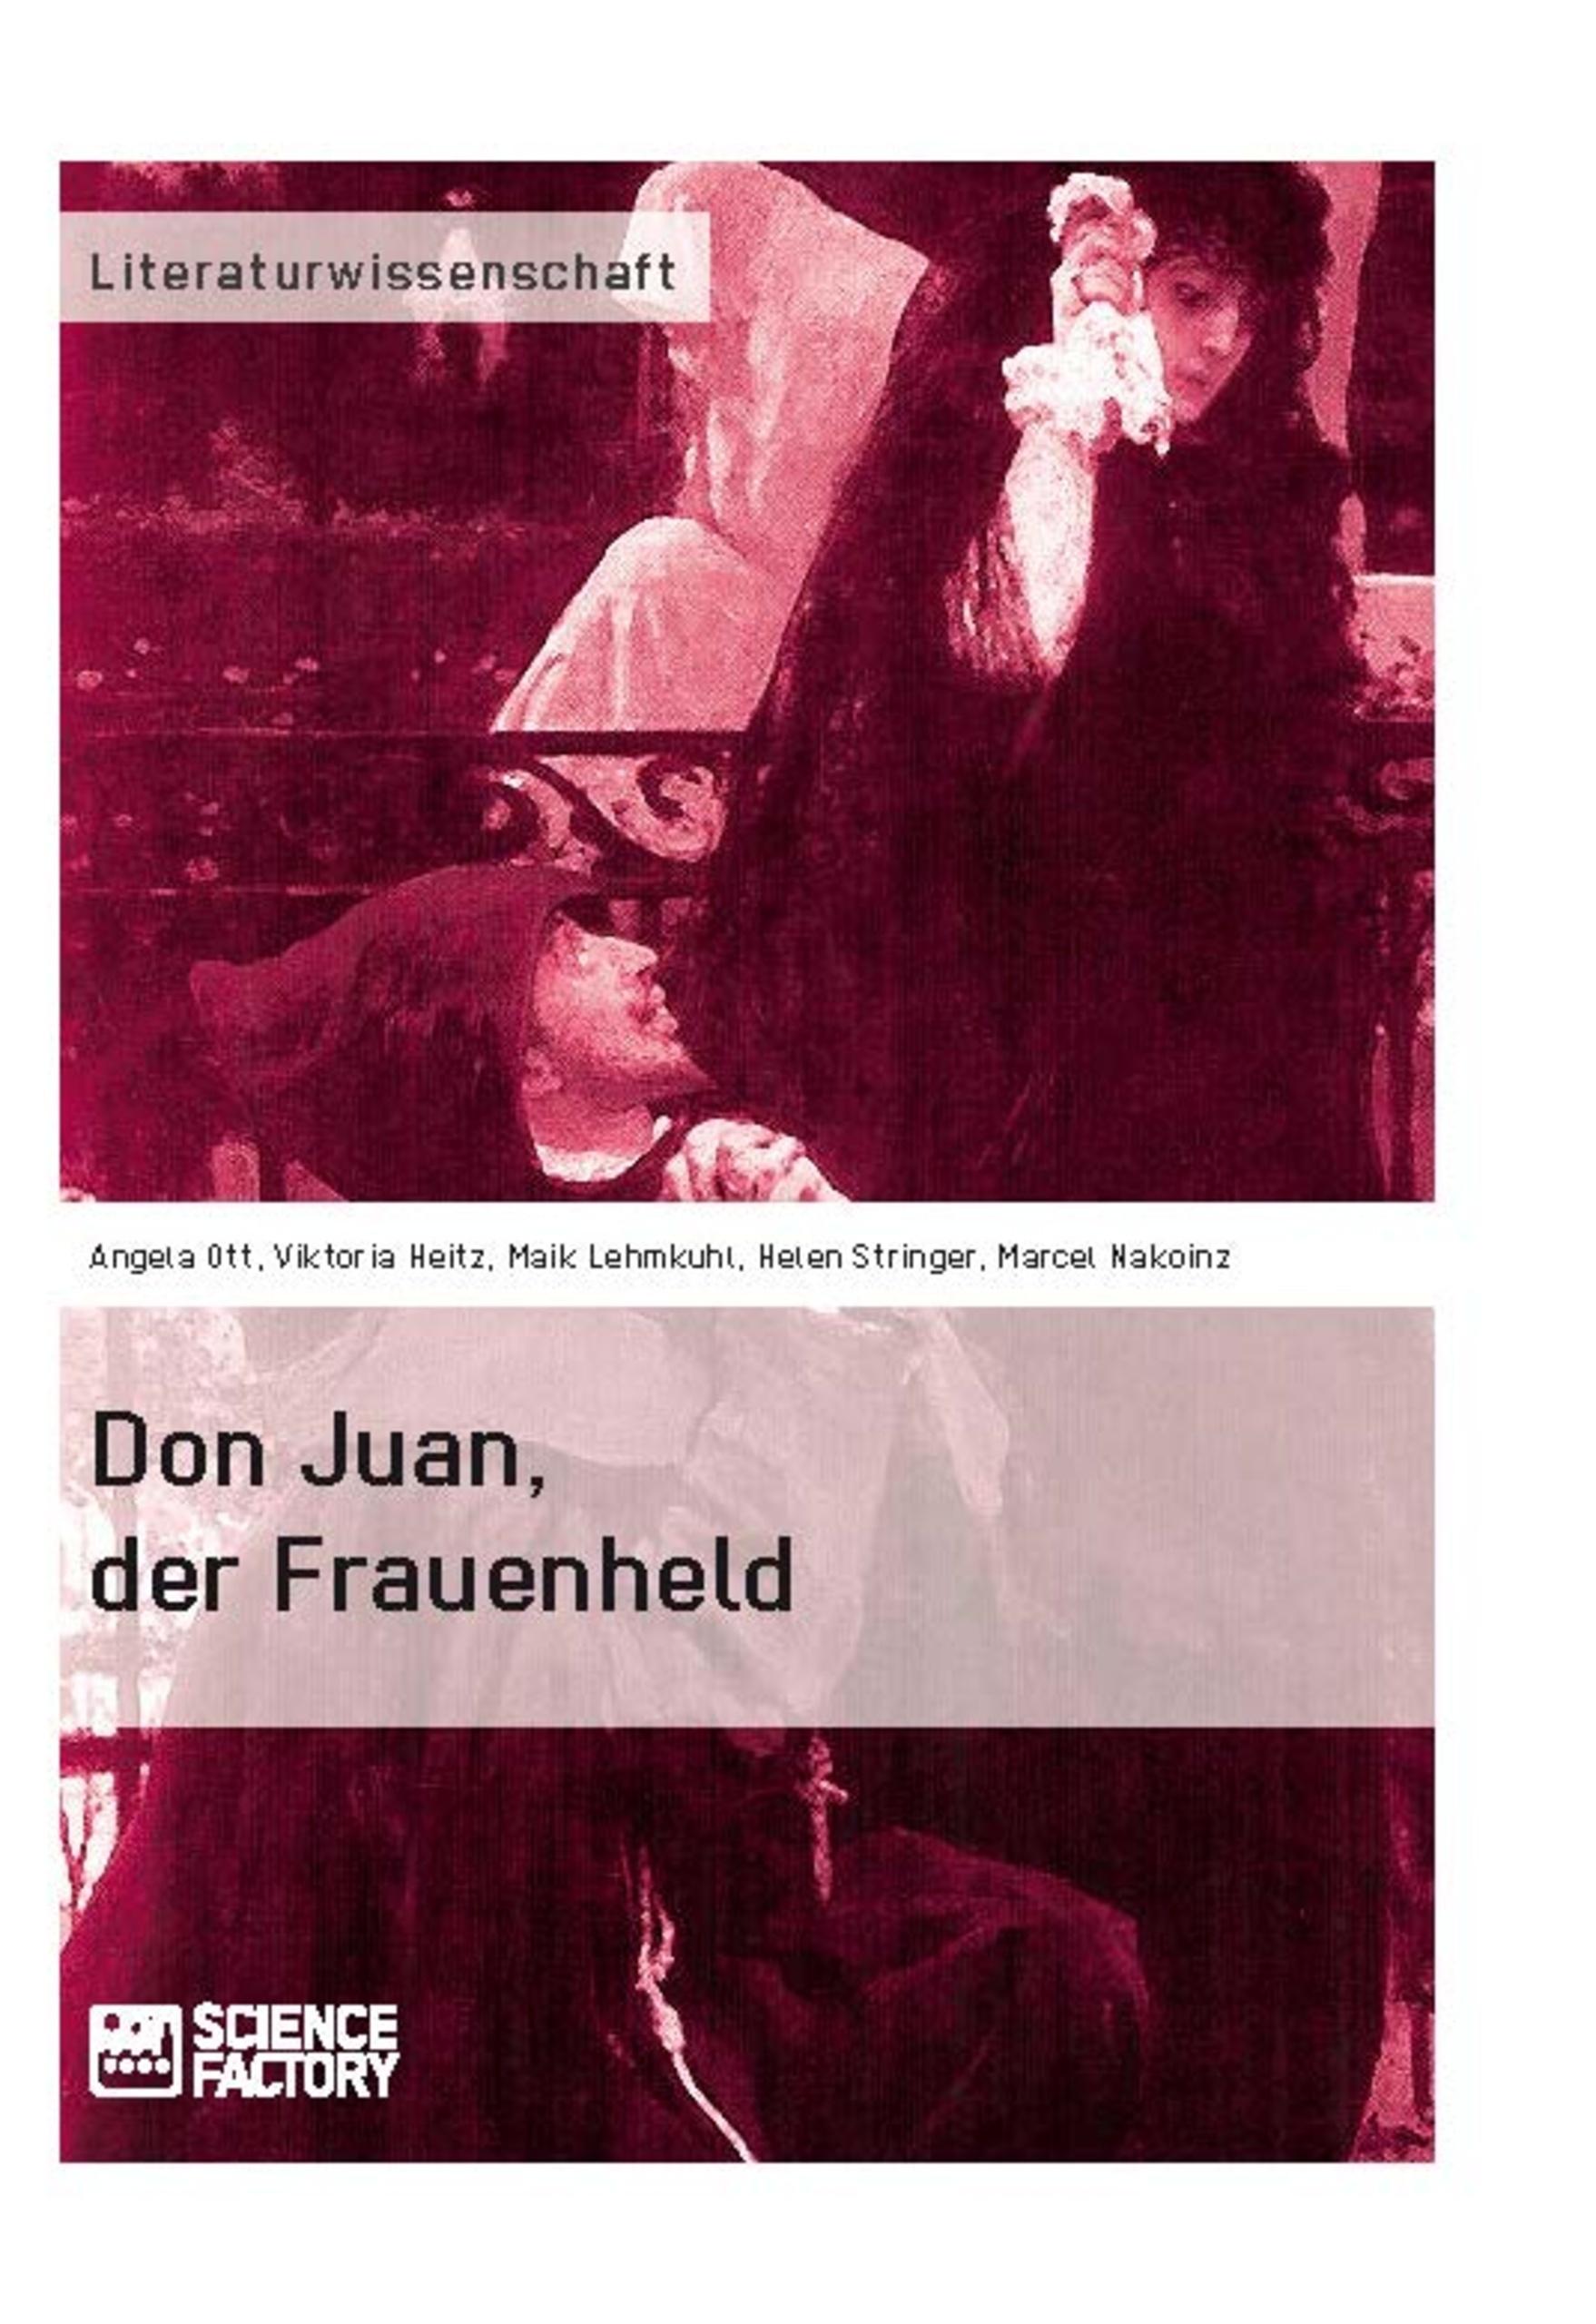 Titel: Don Juan, der Frauenheld